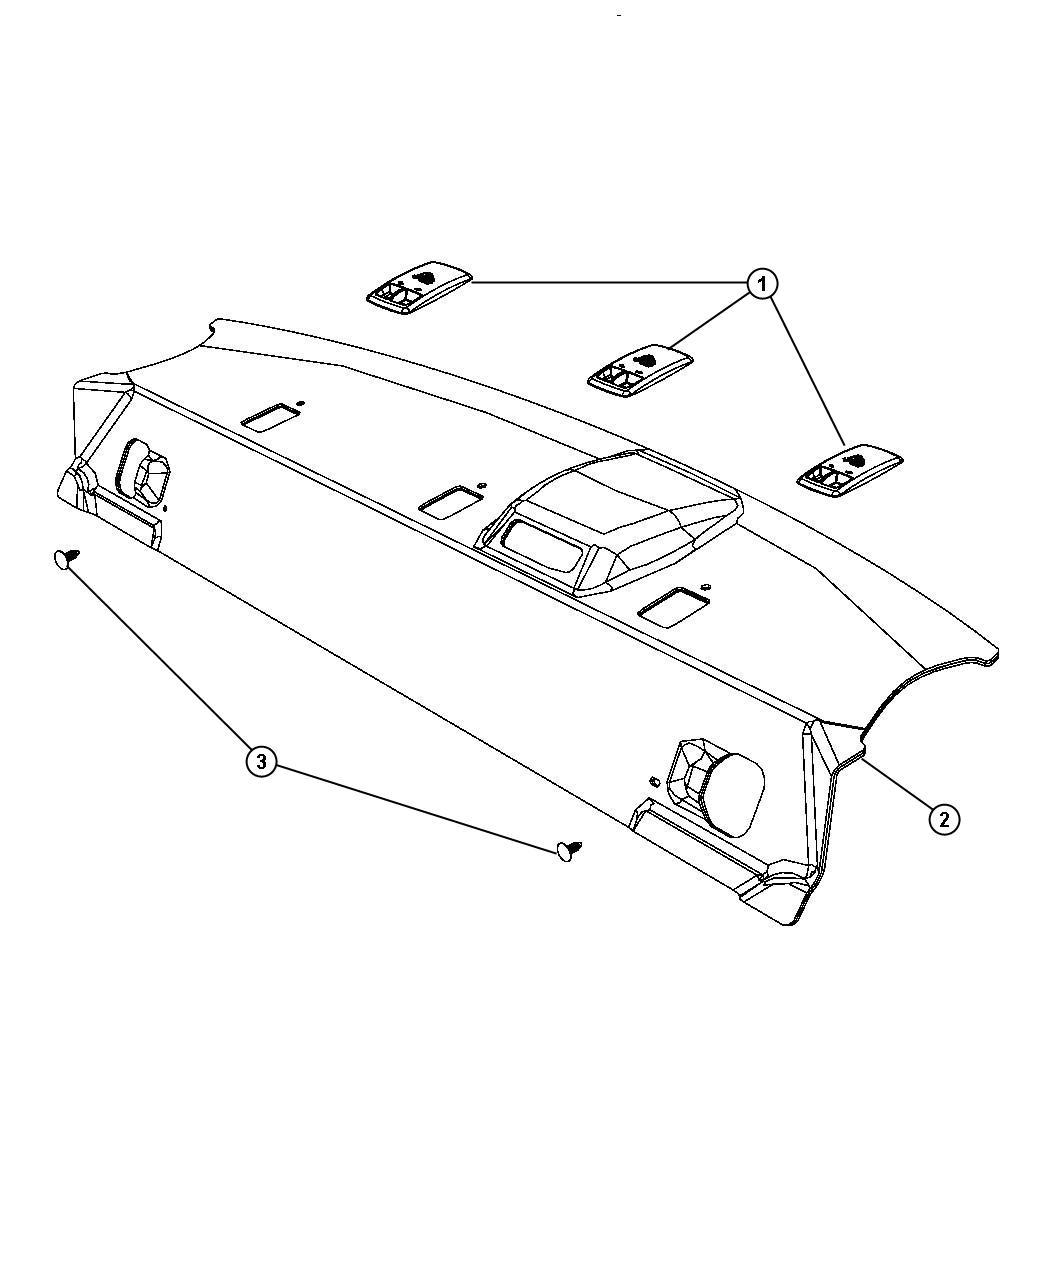 chevy classics car clip art sketch coloring page